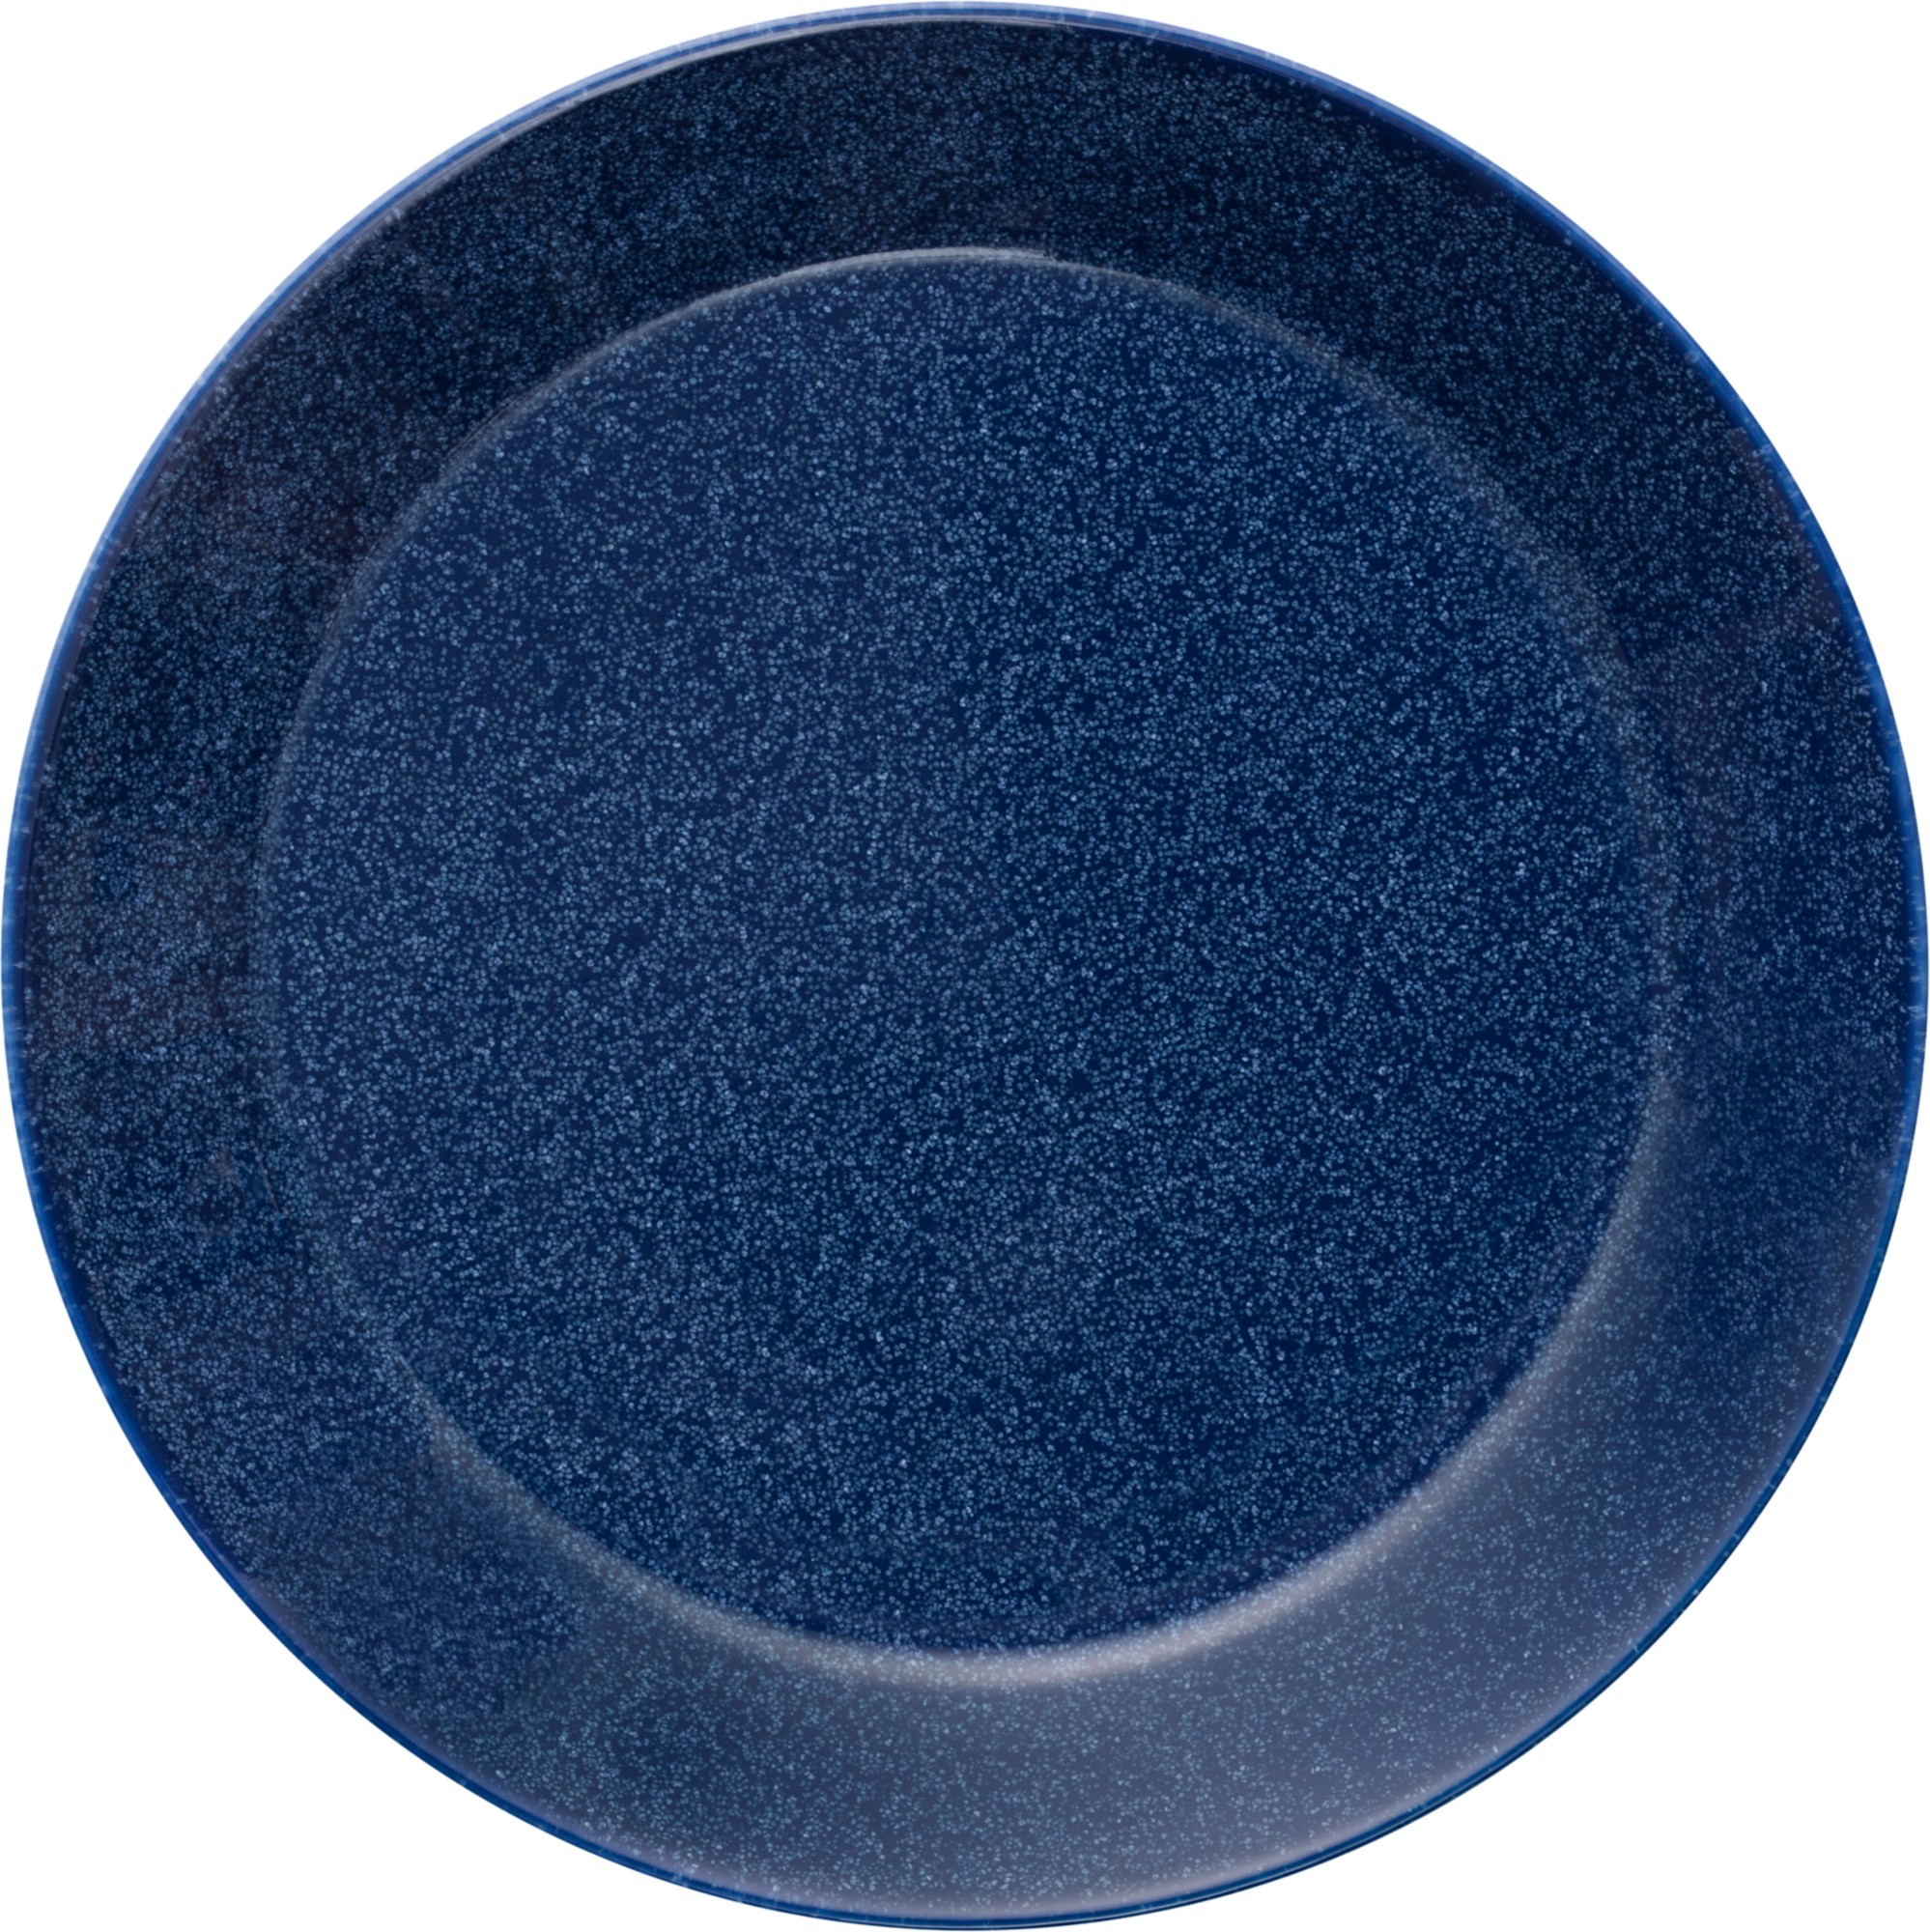 iittala teema plate 17 cm dotted blue iittala com uk